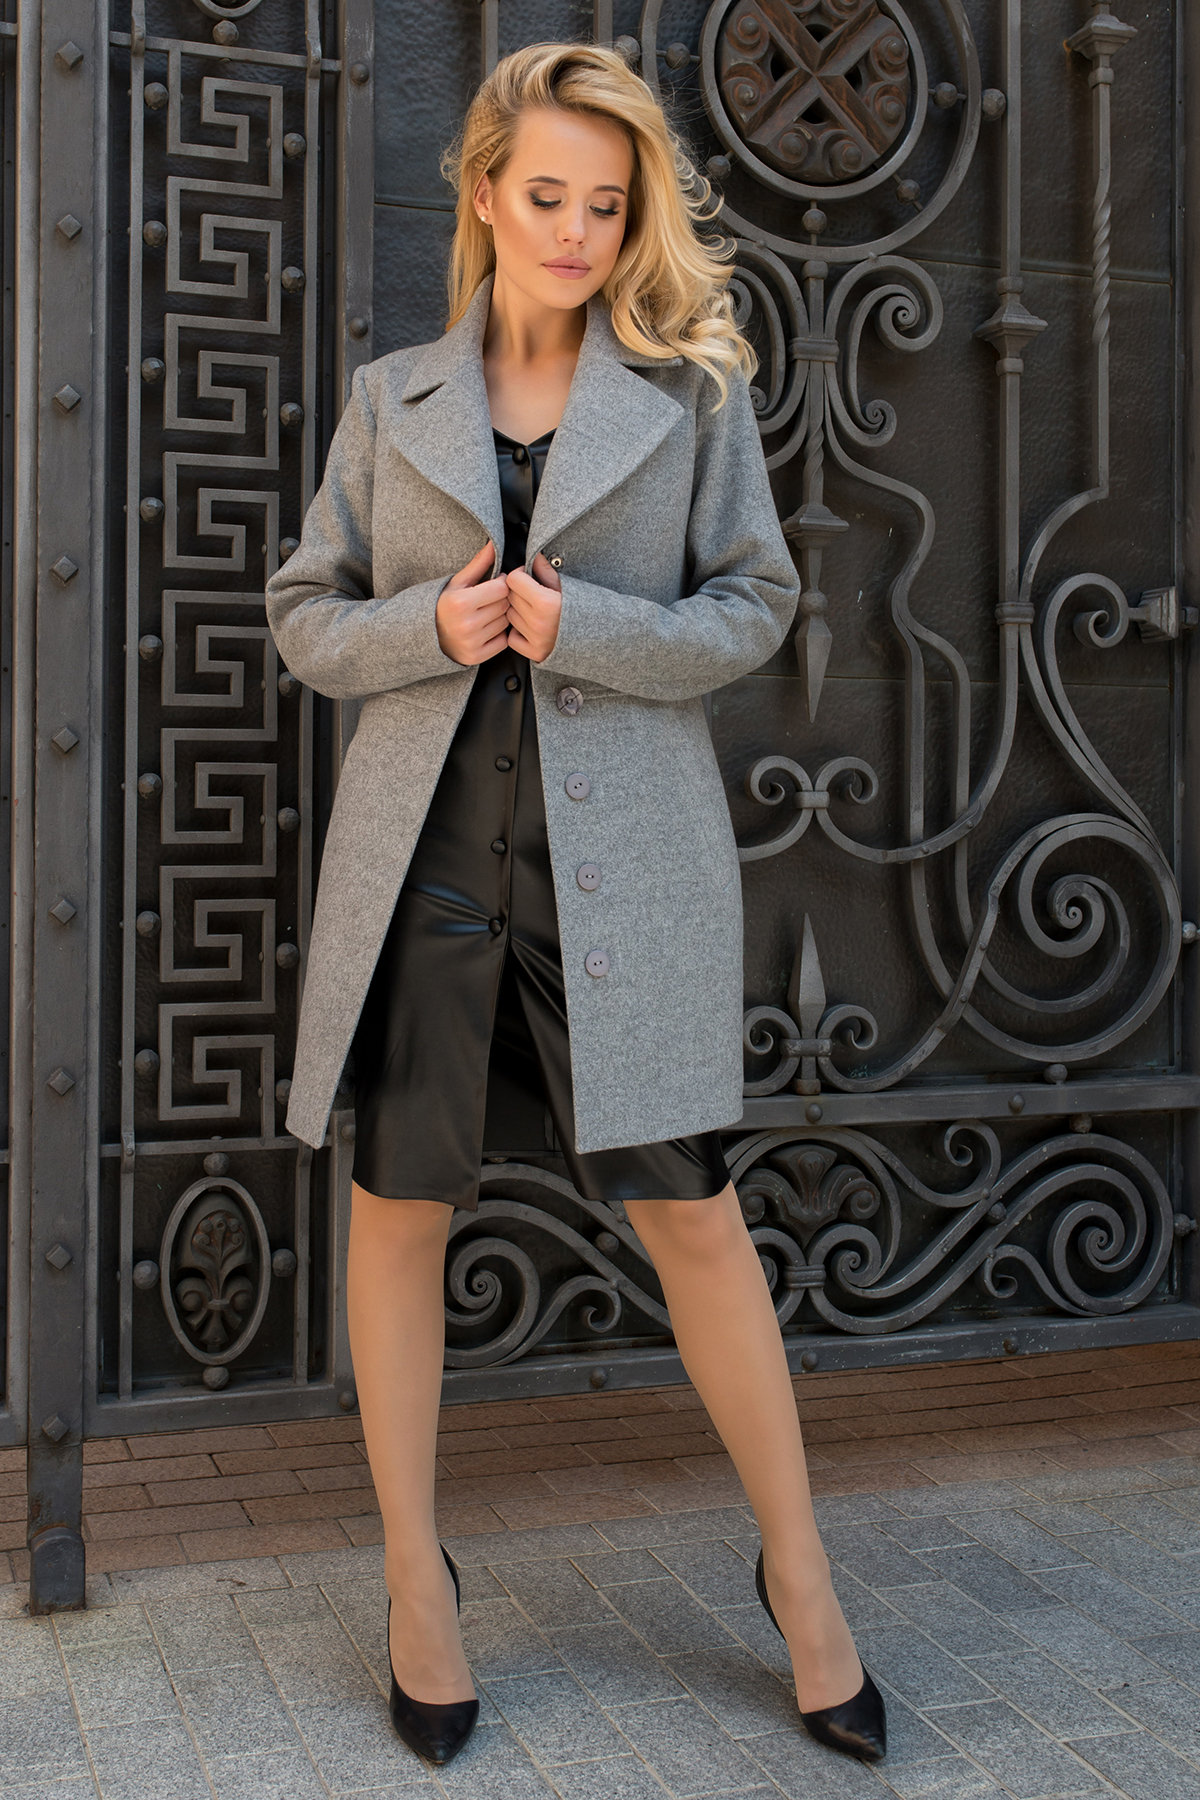 Пальто Габриэлла 7823 АРТ. 43703 Цвет: Серый 1 - фото 1, интернет магазин tm-modus.ru